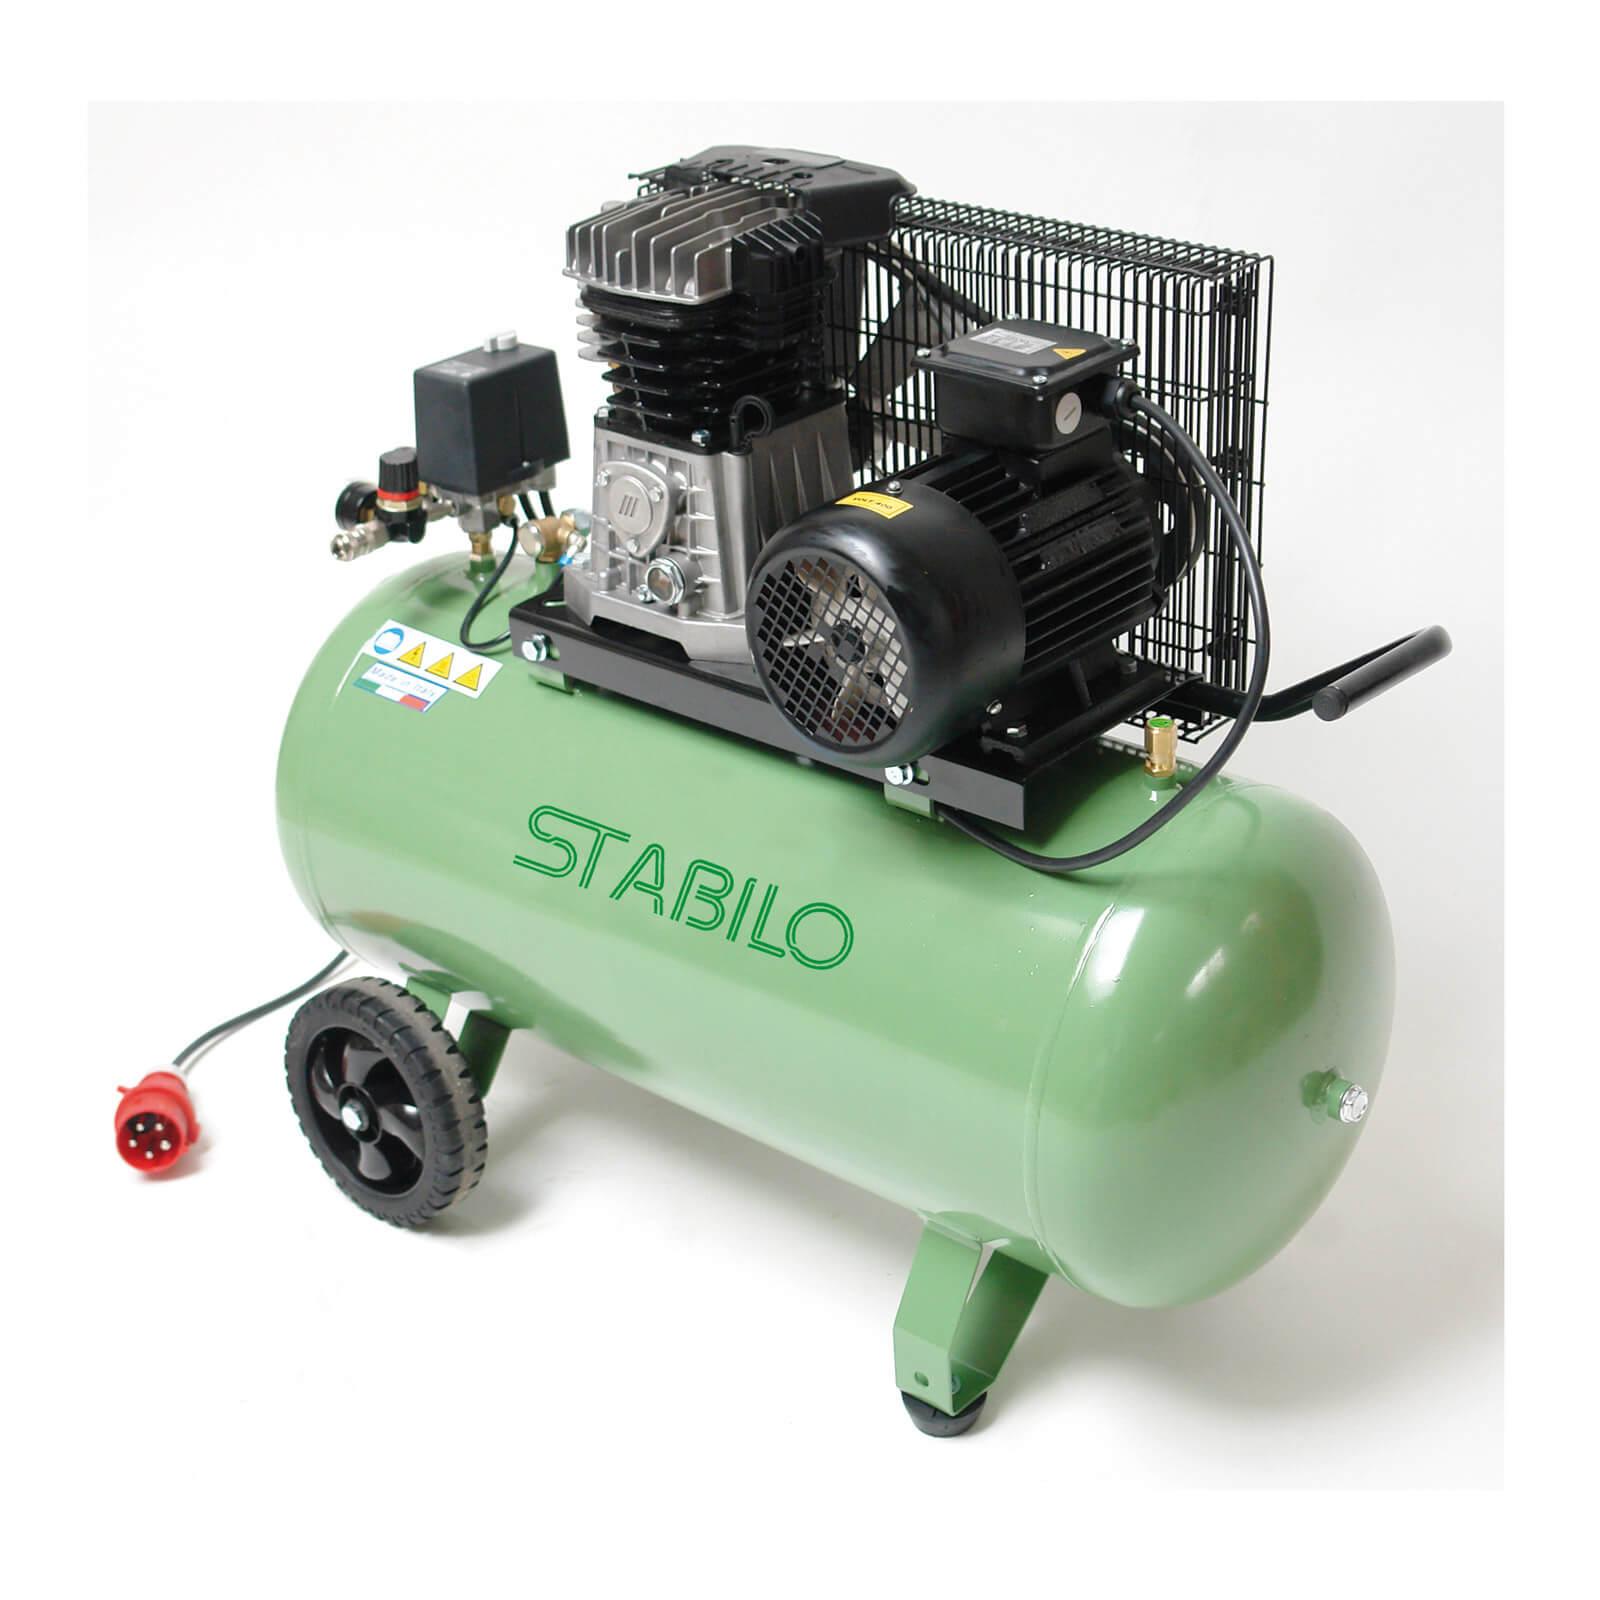 Dema Kompressor 100l 10bar Kolbenkompressor 500/10/100 400V 24513